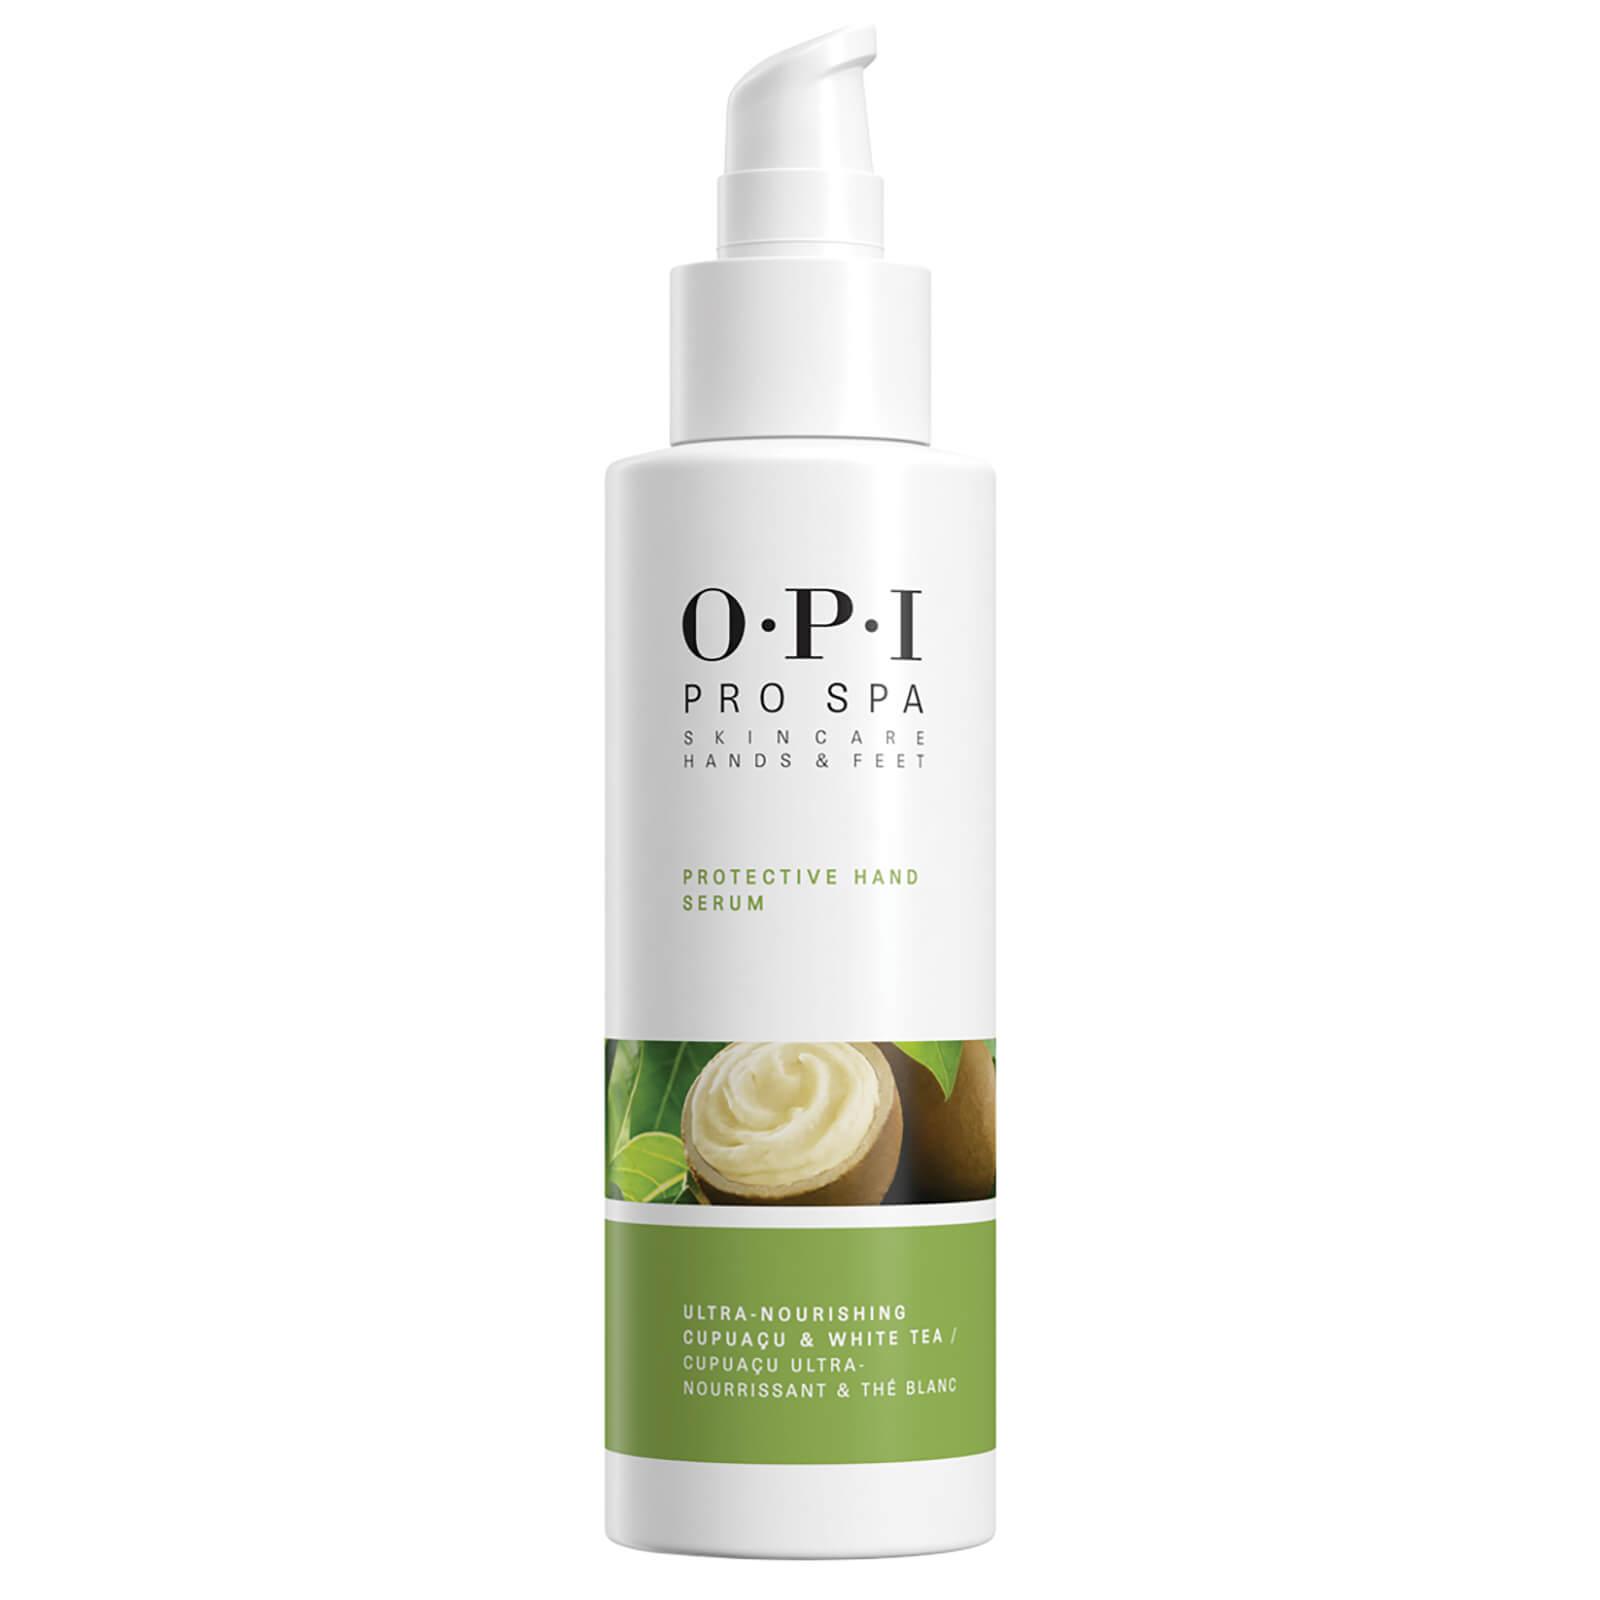 OPI Prospa Protective Hand Serum (Various Sizes) - 112ml